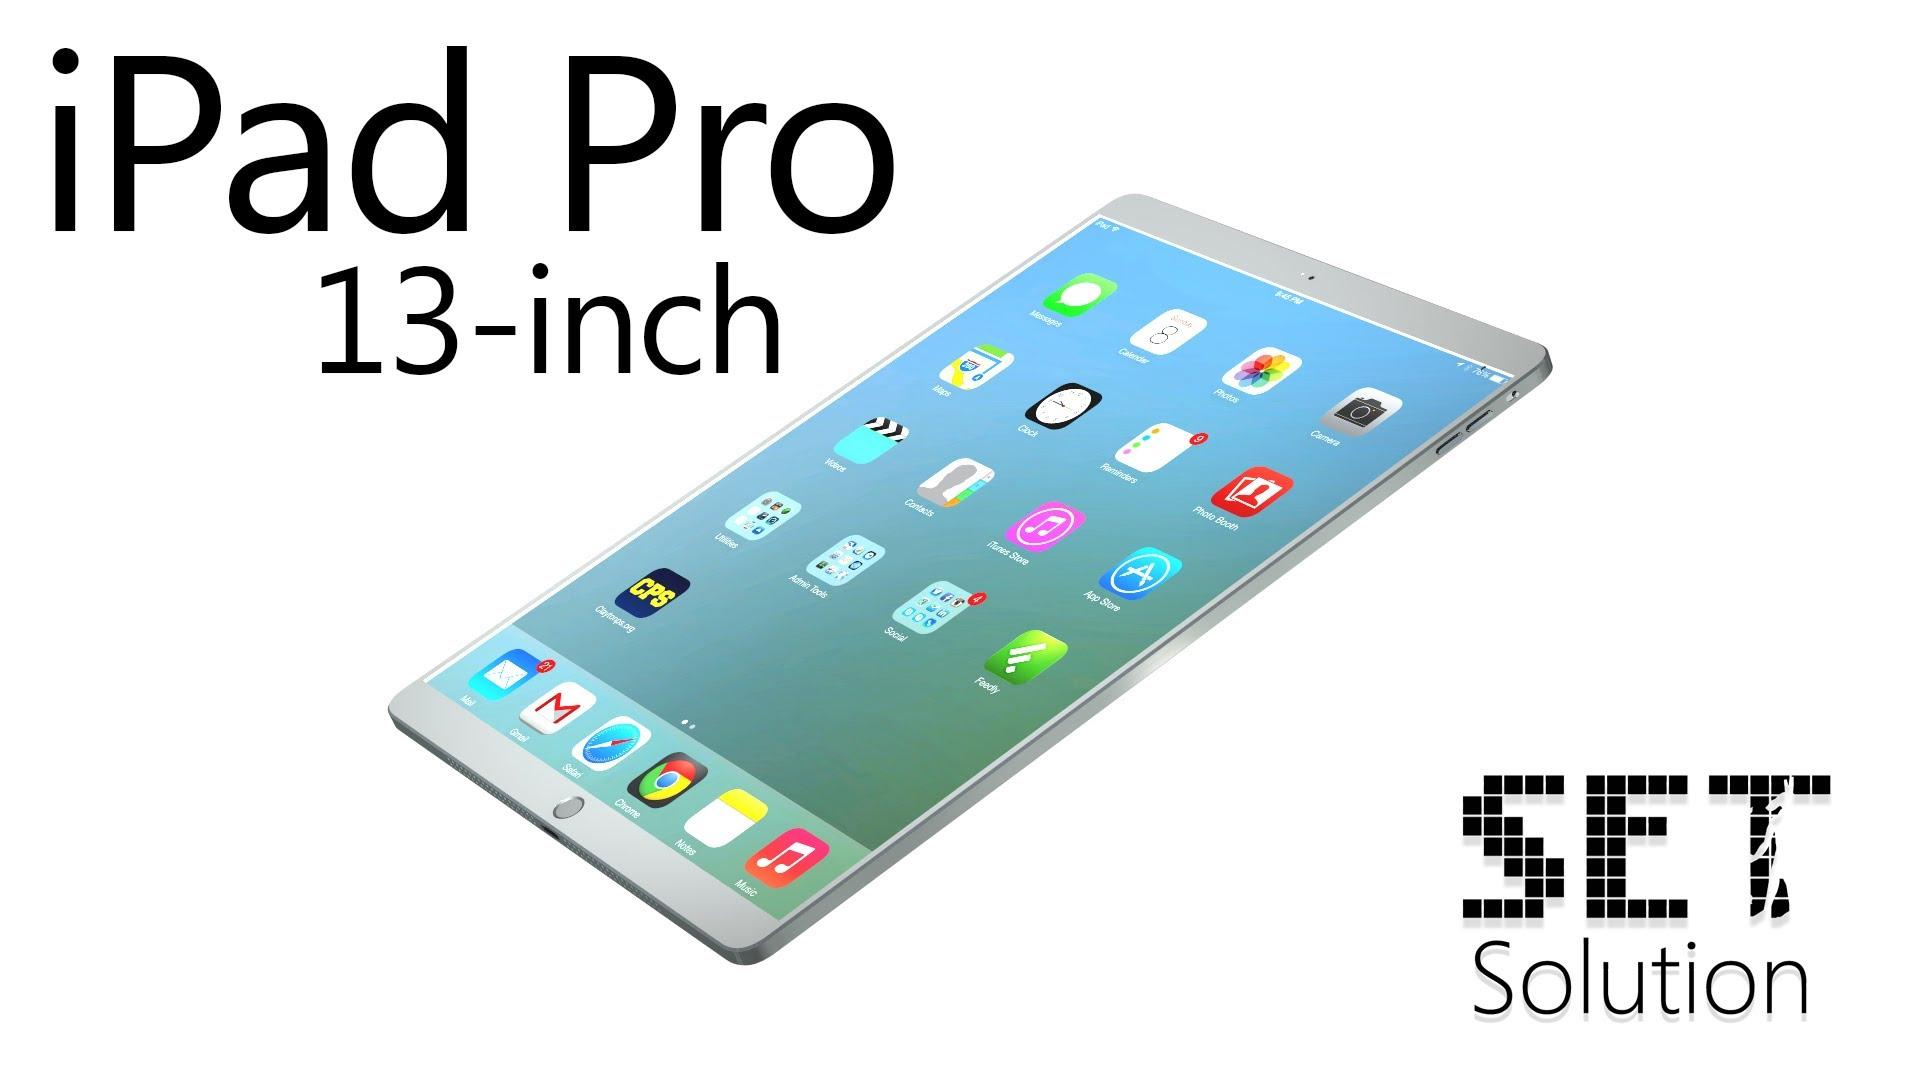 [GERÜCHTE] iPad Pro im November